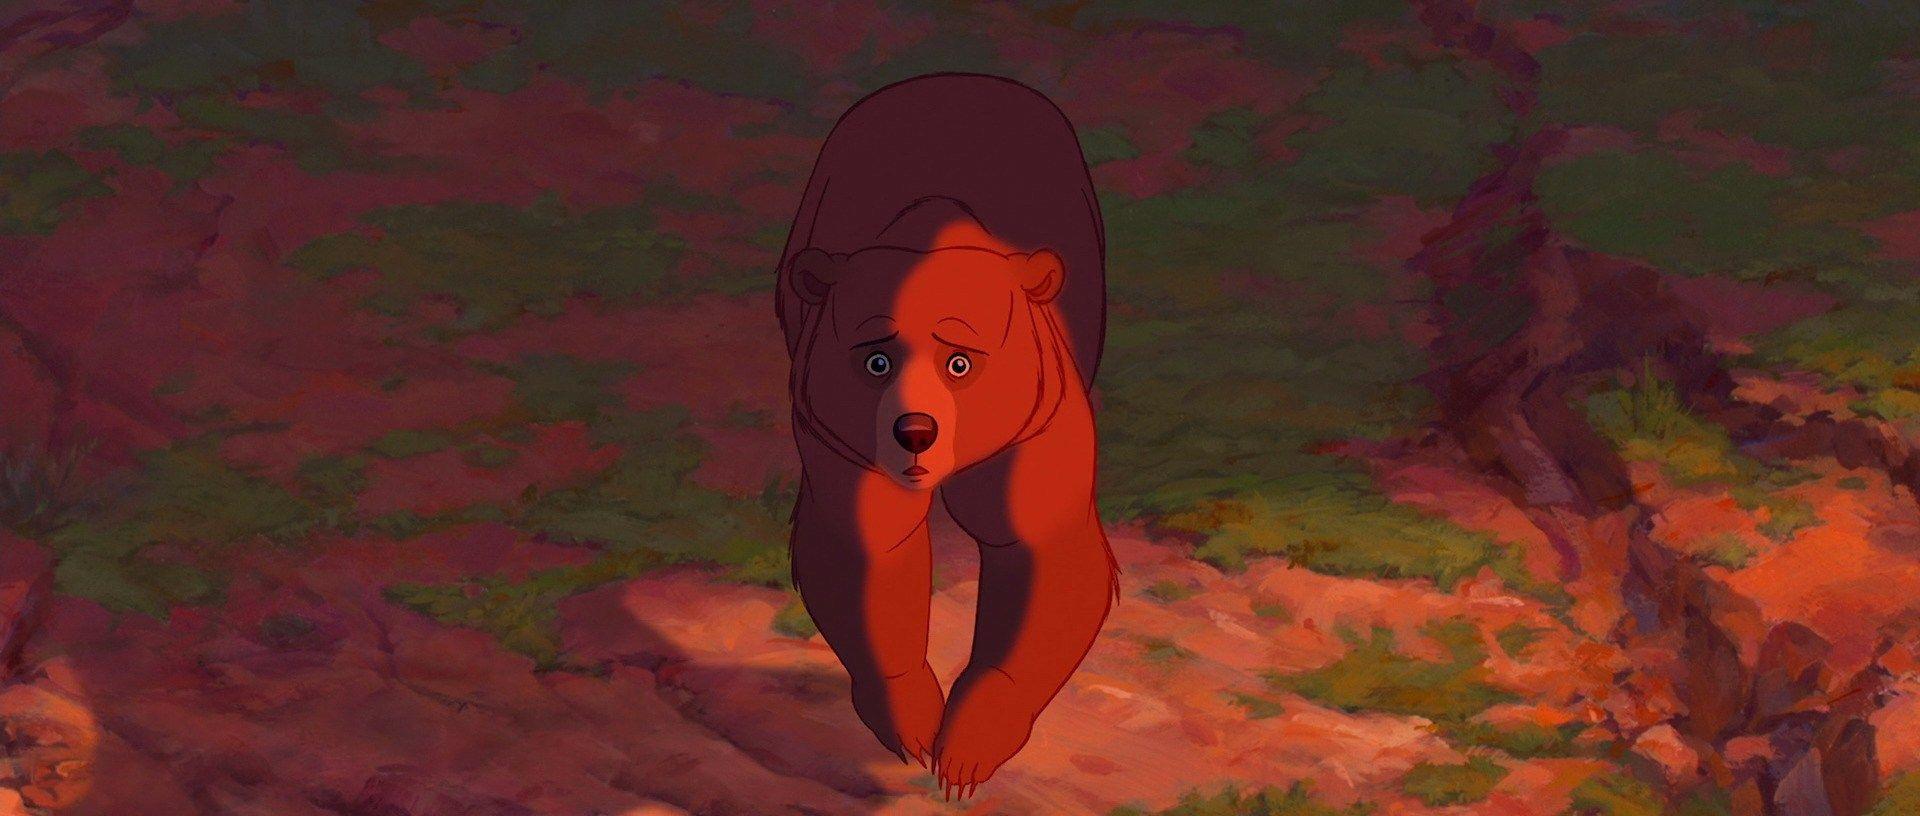 Brother Bear 2003 Animation Screencaps Brother Bear Disney Animated Movies Animation